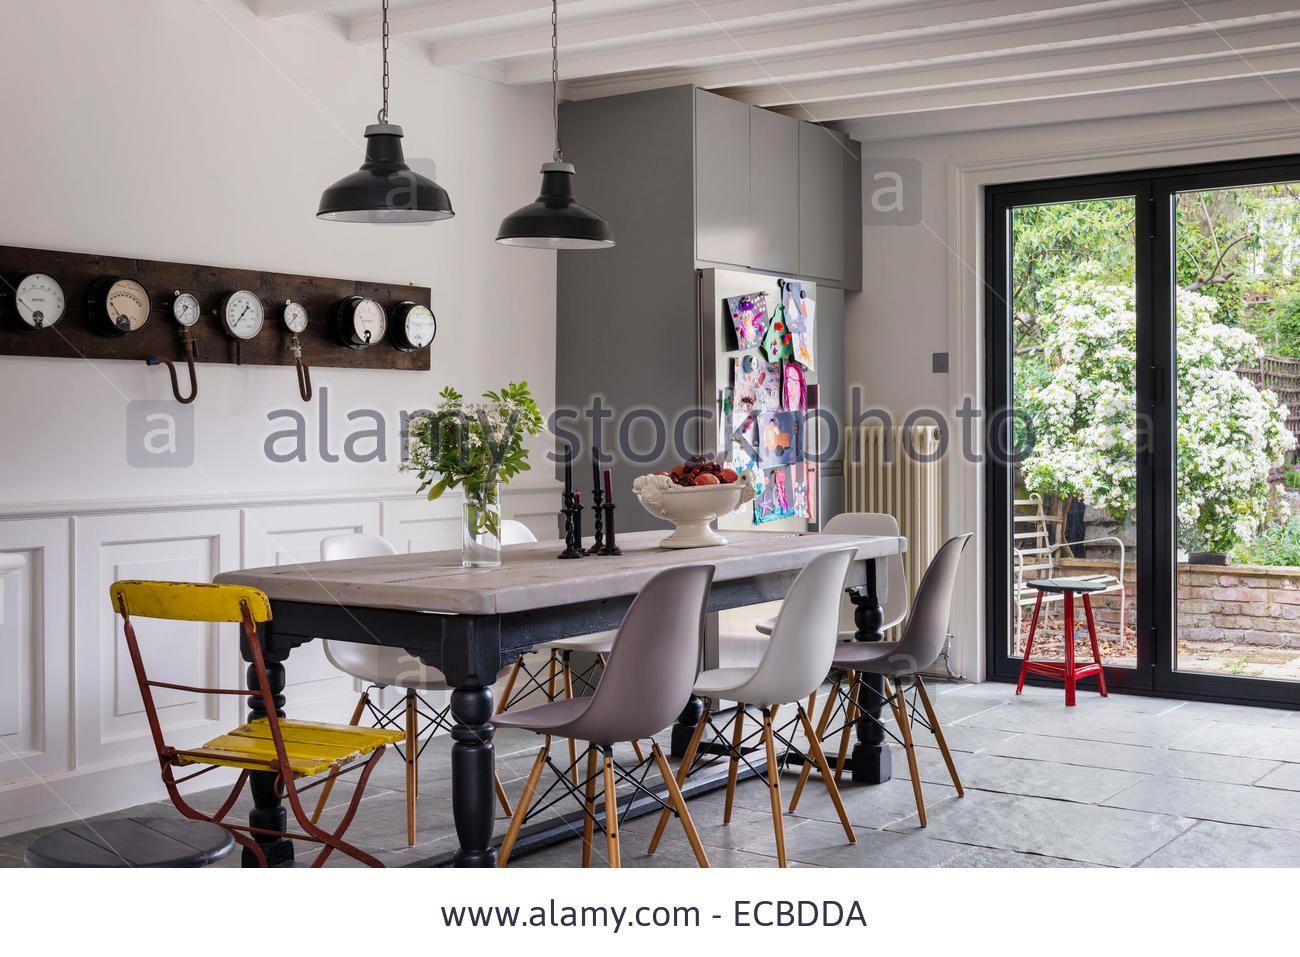 Eames eiffel chair dining room - Explore White Chairs Farmhouse Table And More Eames Eiffel